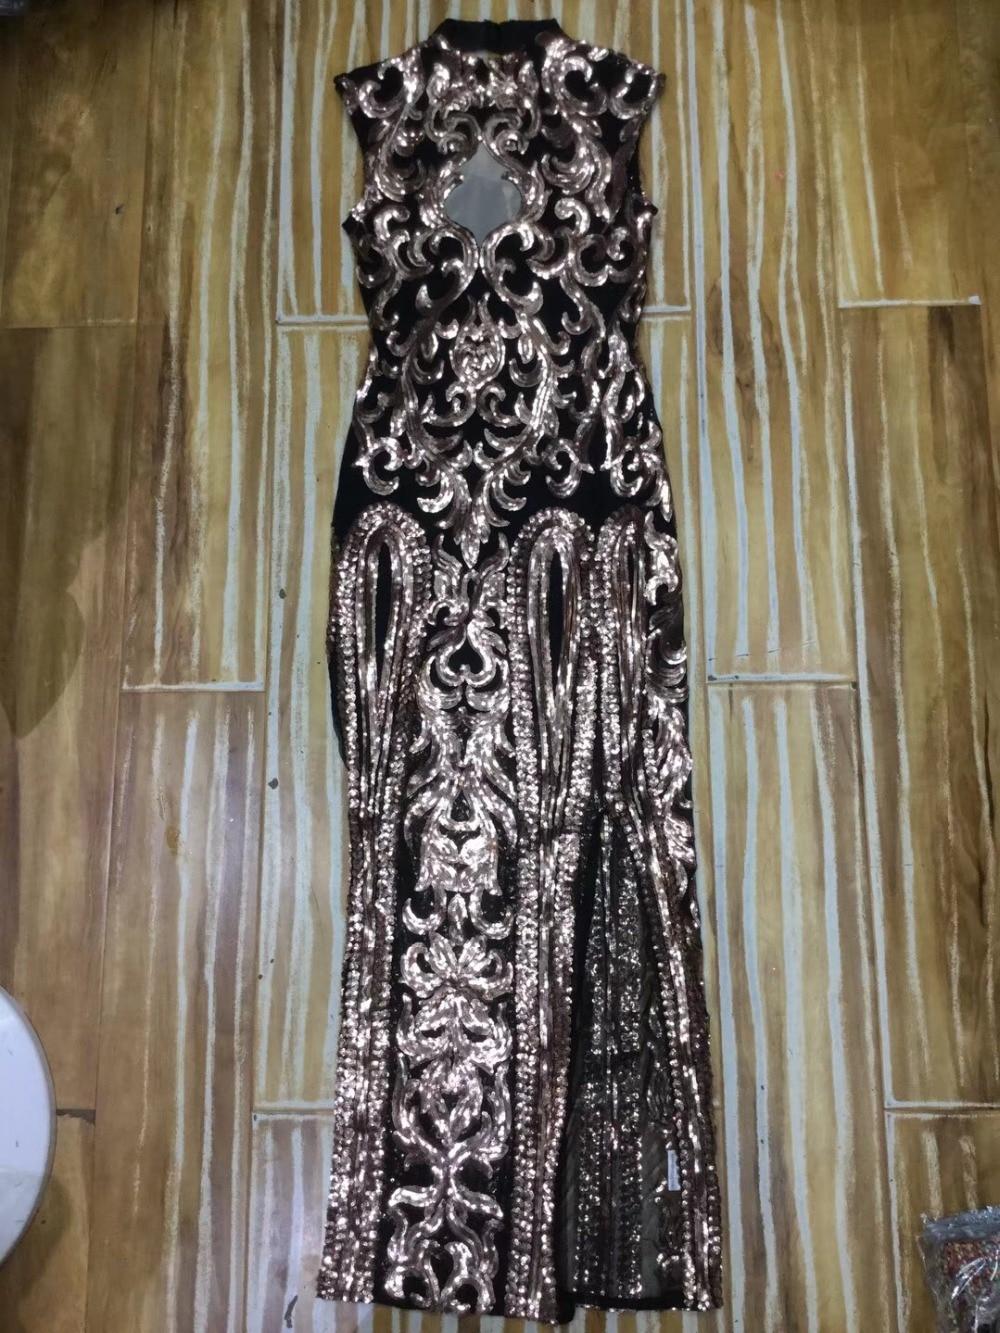 Long Women Sequins Designer Elegant Keyhole Dress Wholesale Mesh Sexy Party Bling 2018 Bodycon c0pwRfRqO